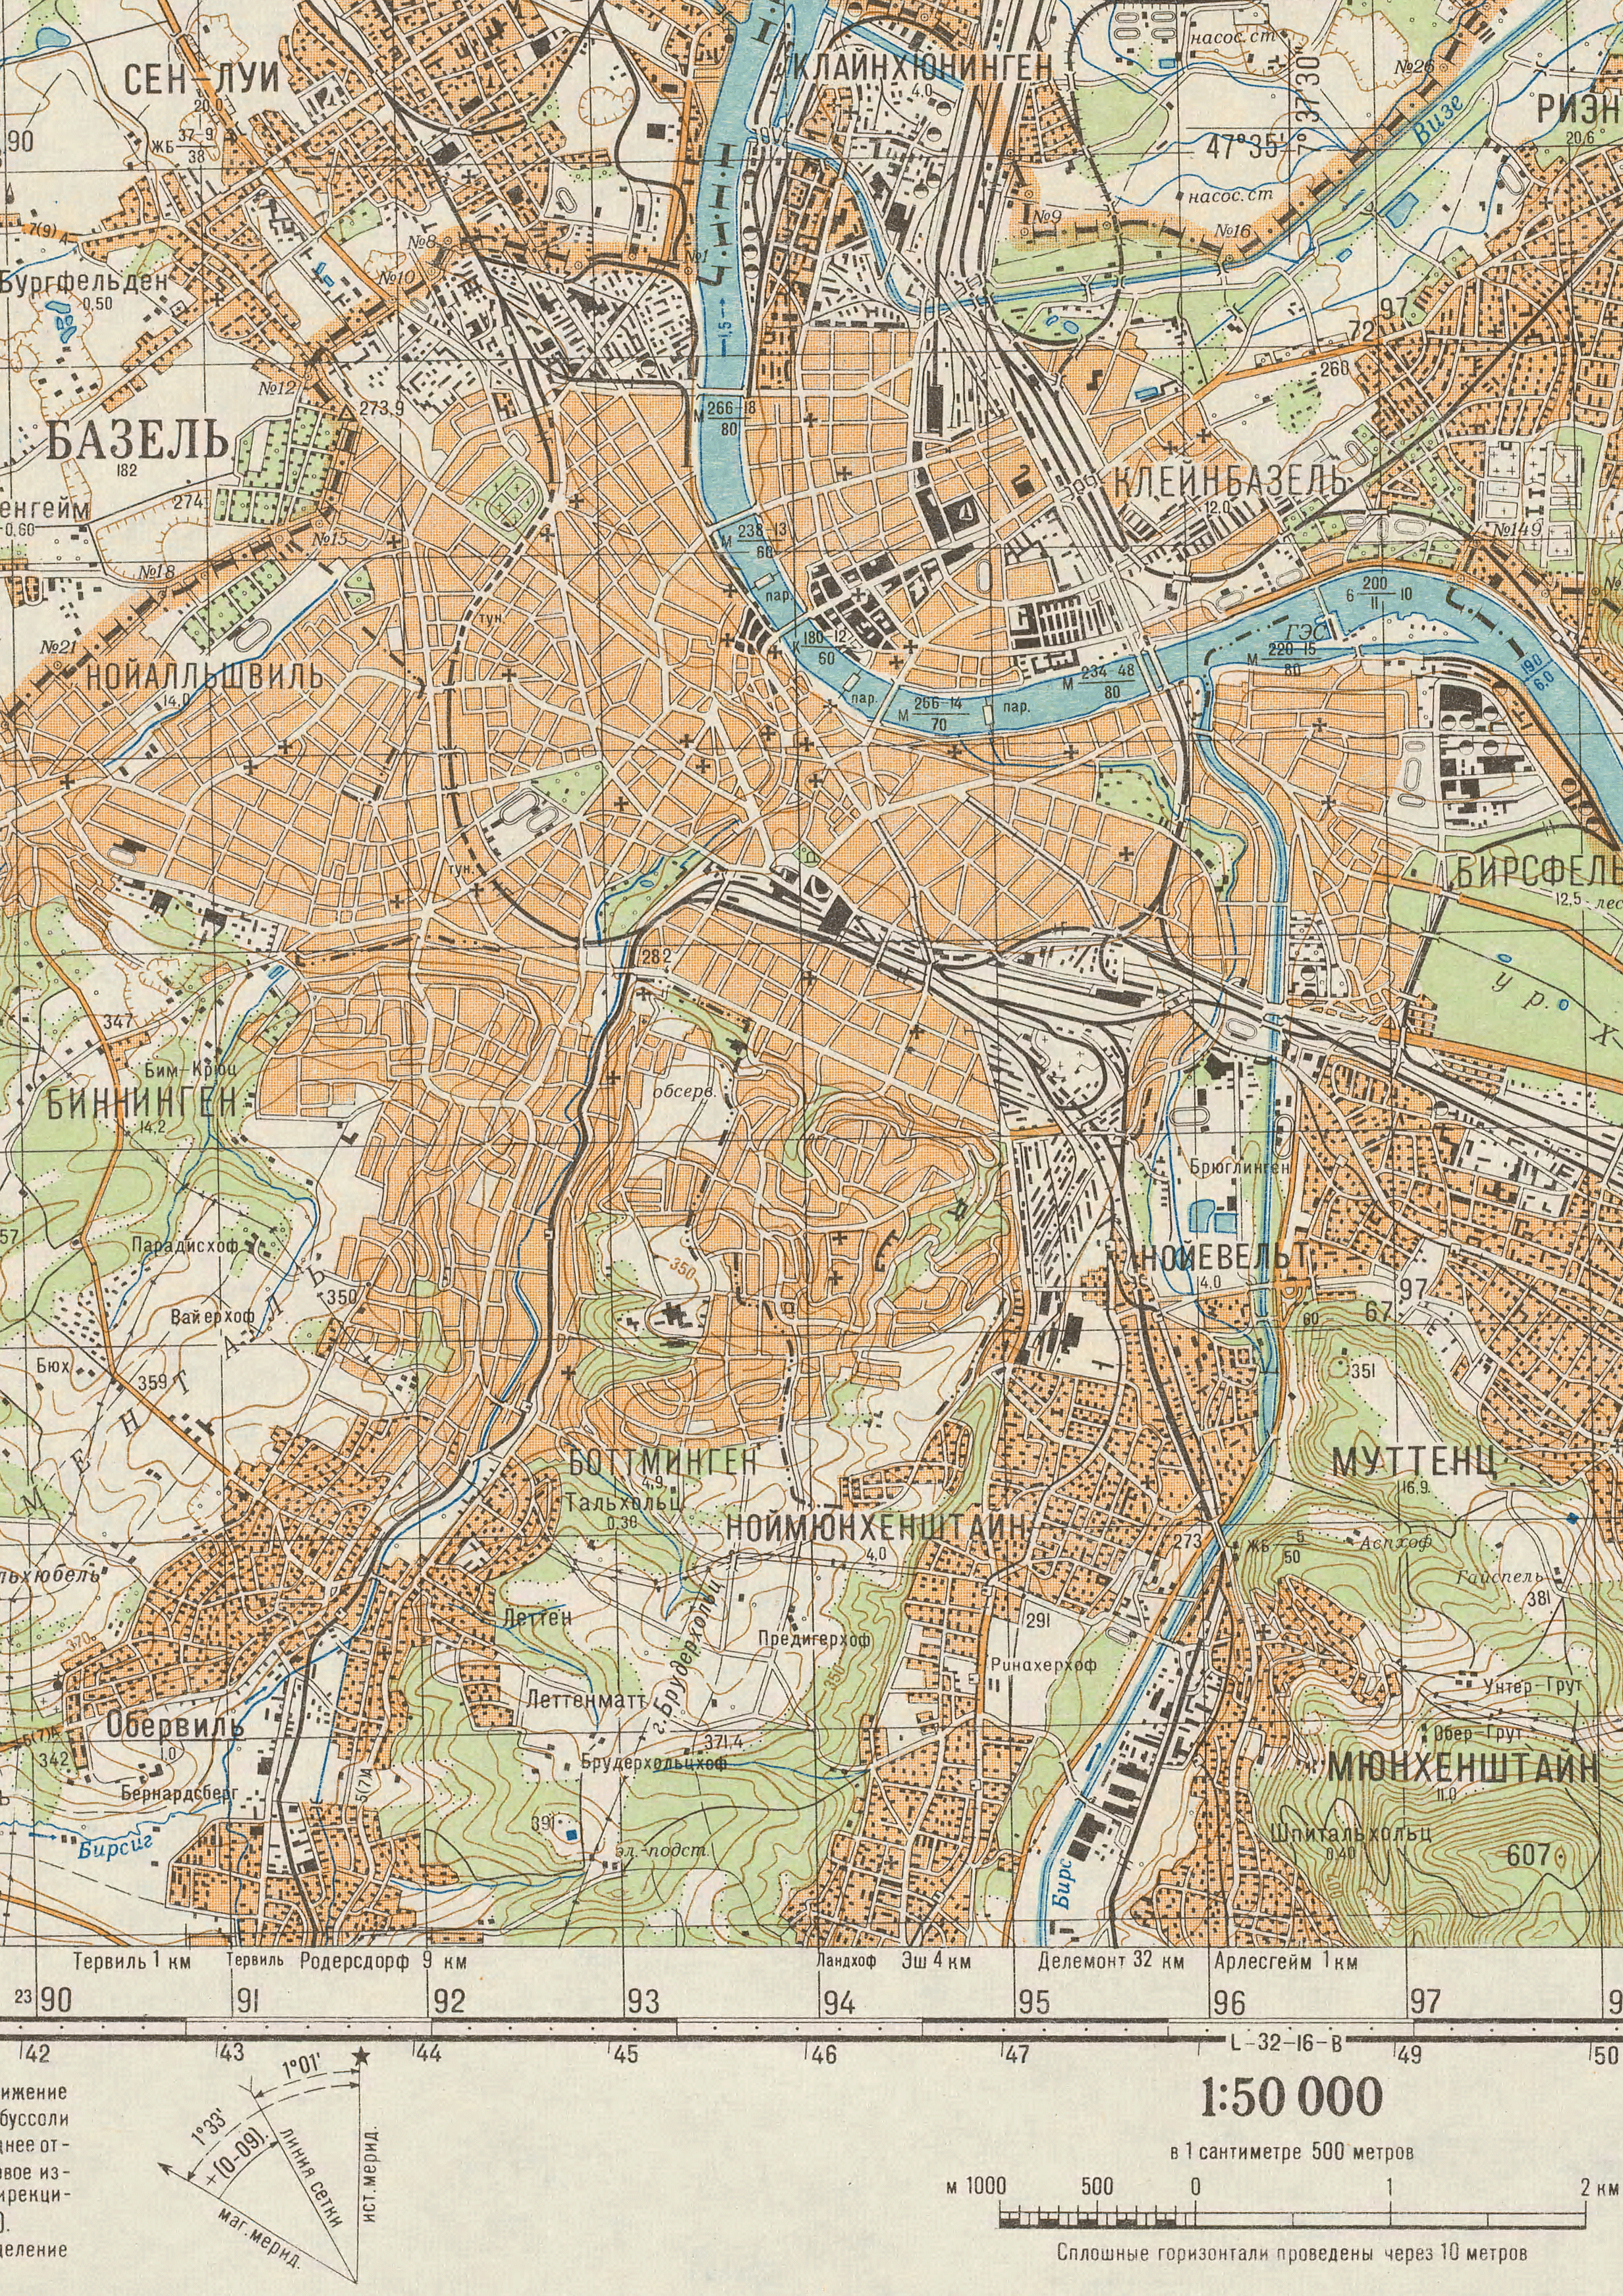 Russische Karte, 1971, Basel